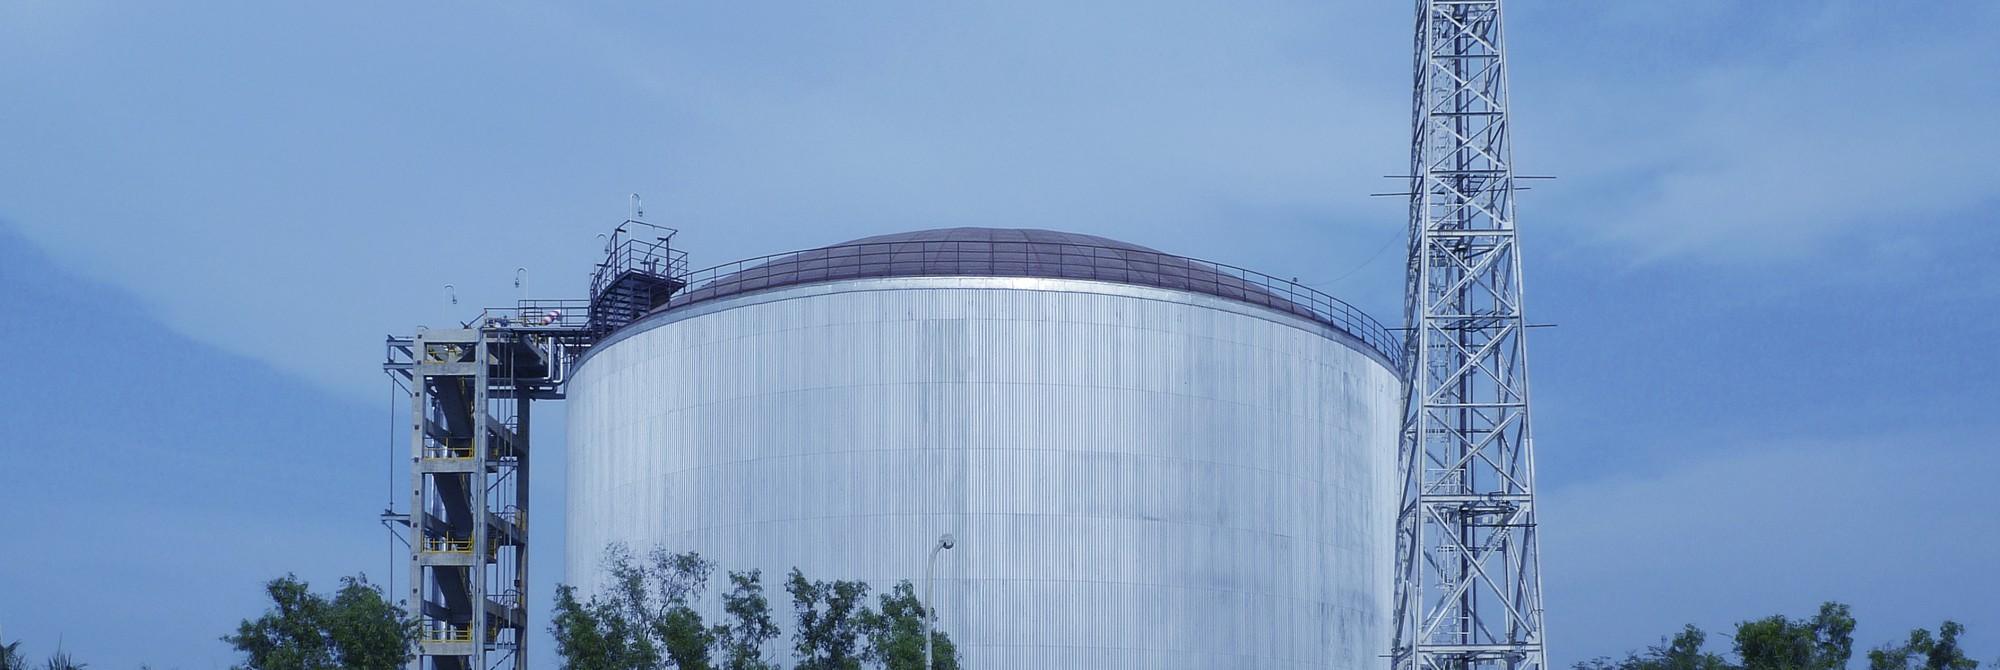 Cryogenic Storages Ammonia Storages